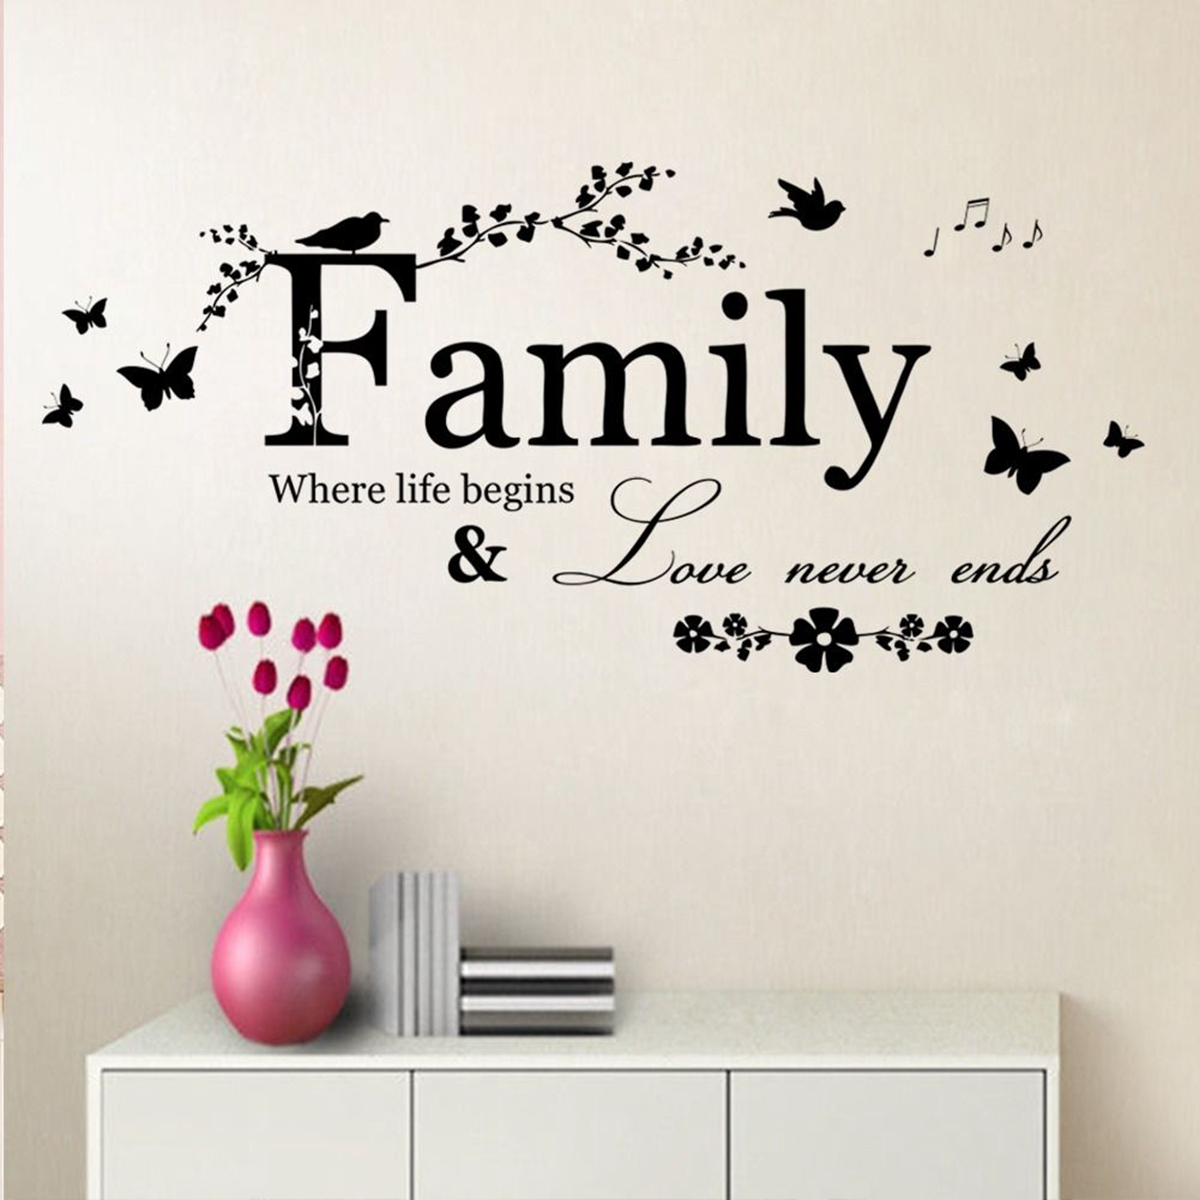 Balloon Bike Mural Wall Sticker Home Kitchen Room Decal Decoration Accessories